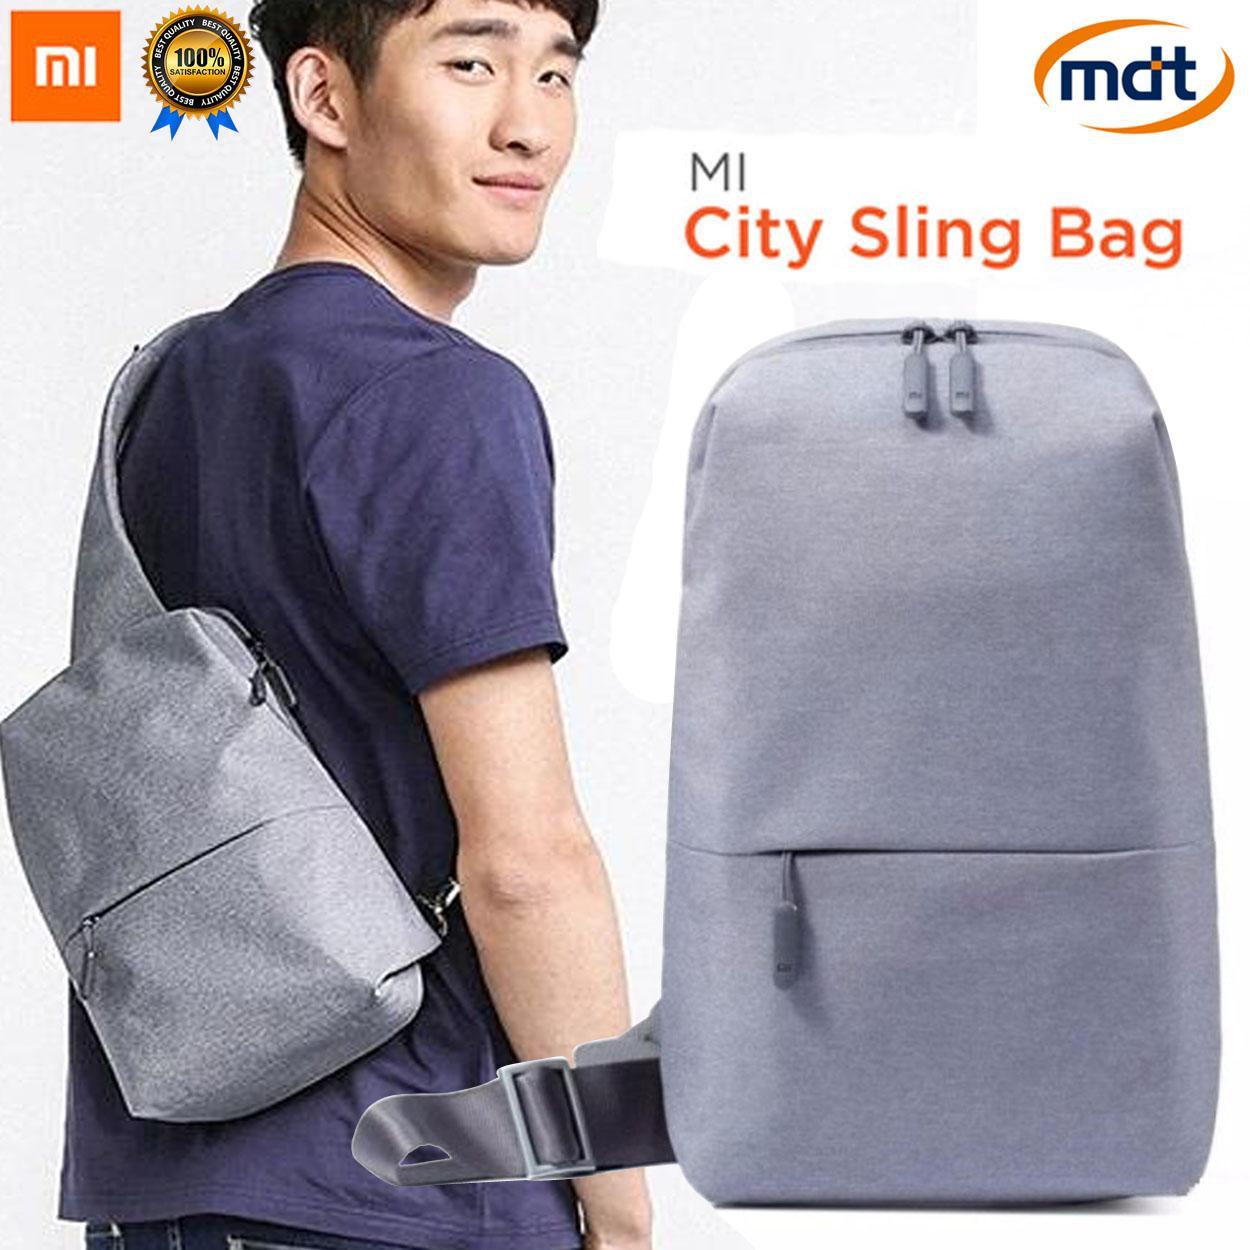 8017fcc657ee Xiaomi Bag Sling Chest Bag Waterproof Shoulder Bag Urban Leisure Sport  Backpack Unisex Rucksack